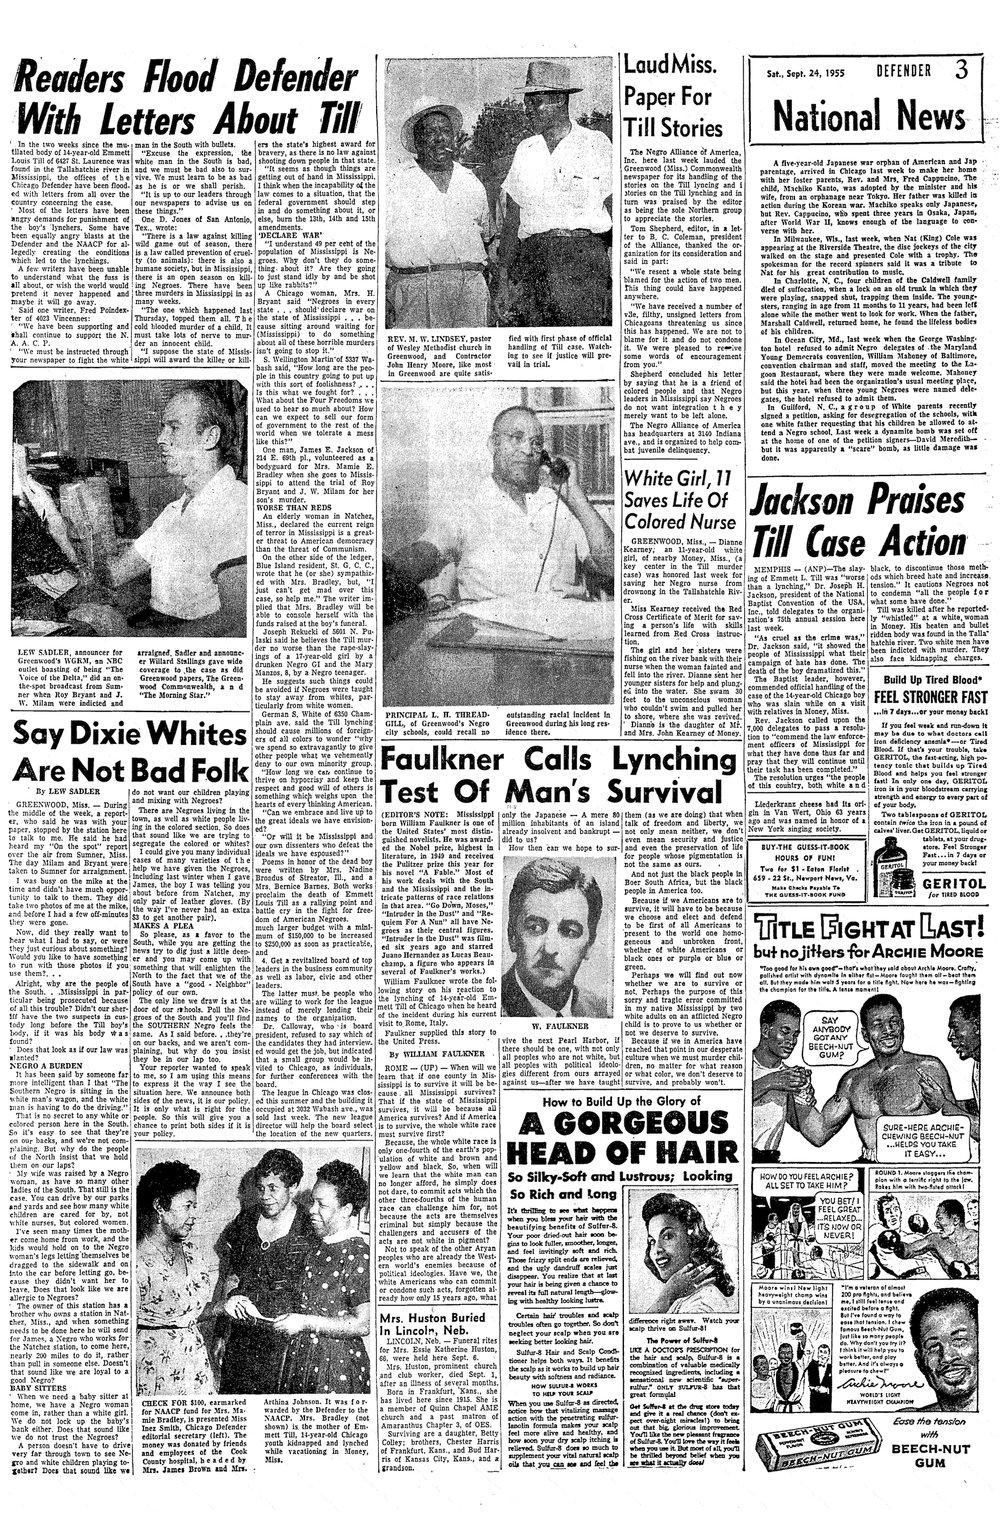 9.24.1955